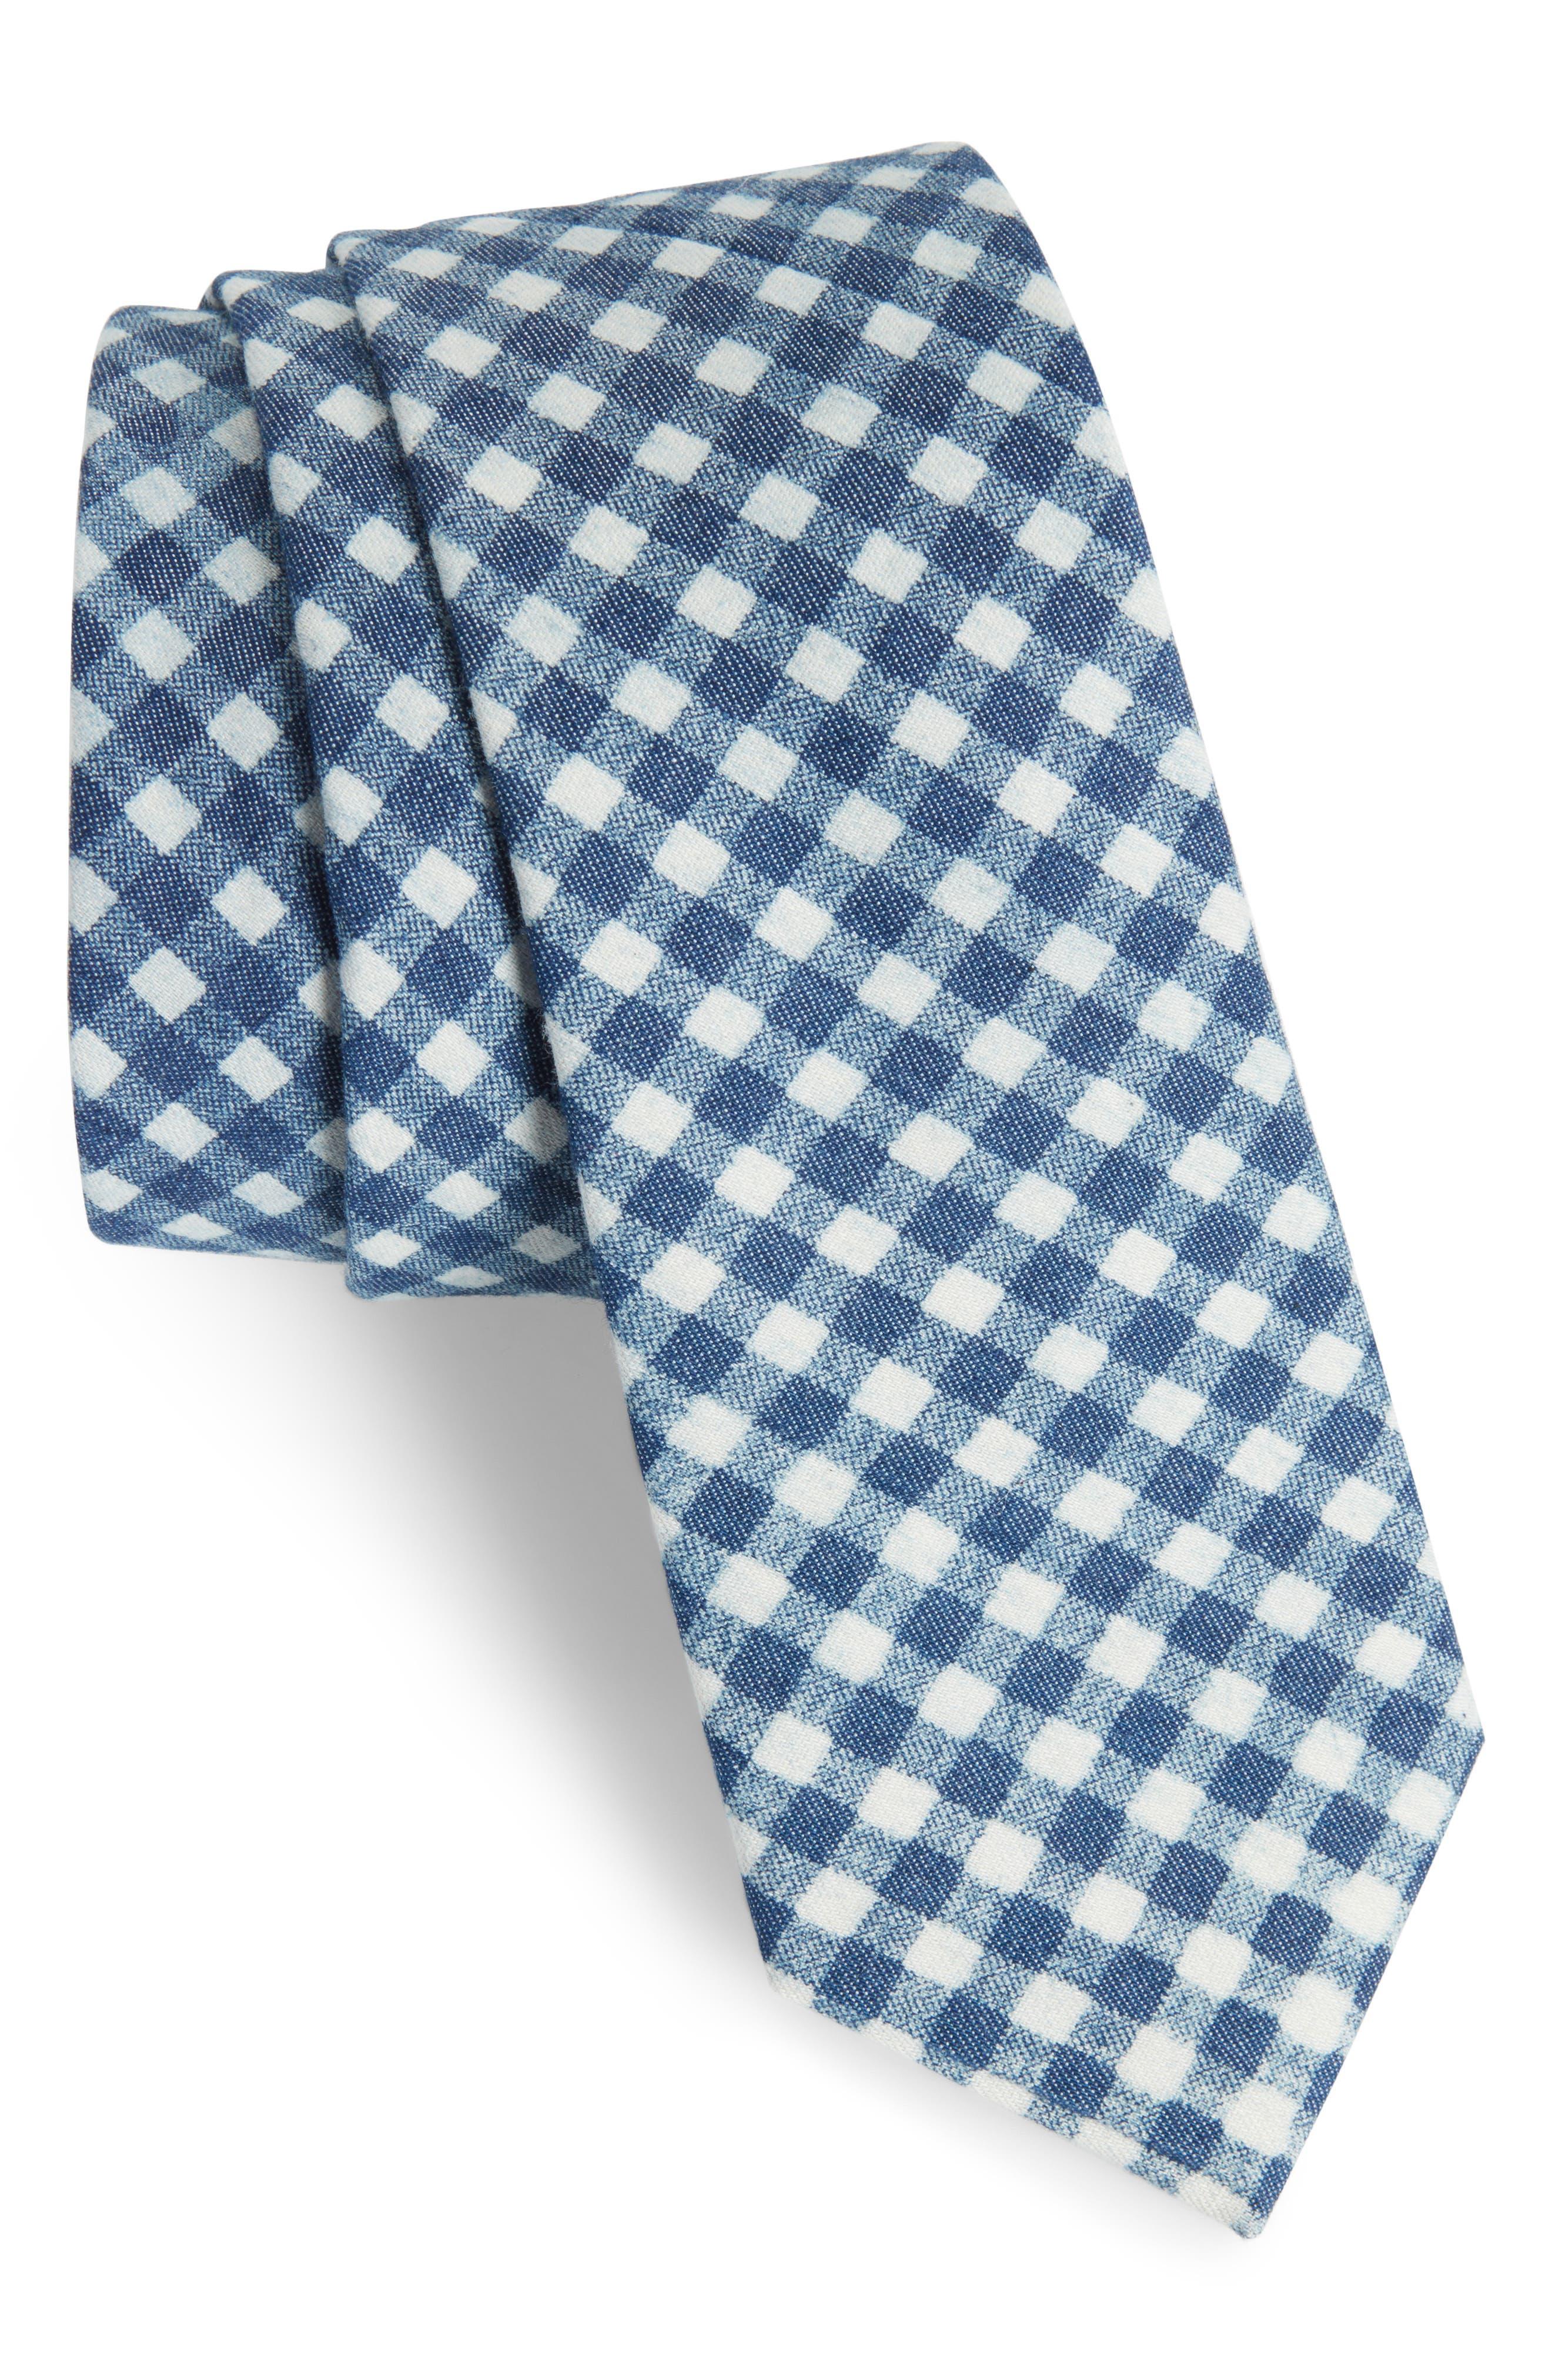 Main Image - Nordstrom Men's Shop Freeman Check Cotton Skinny Tie